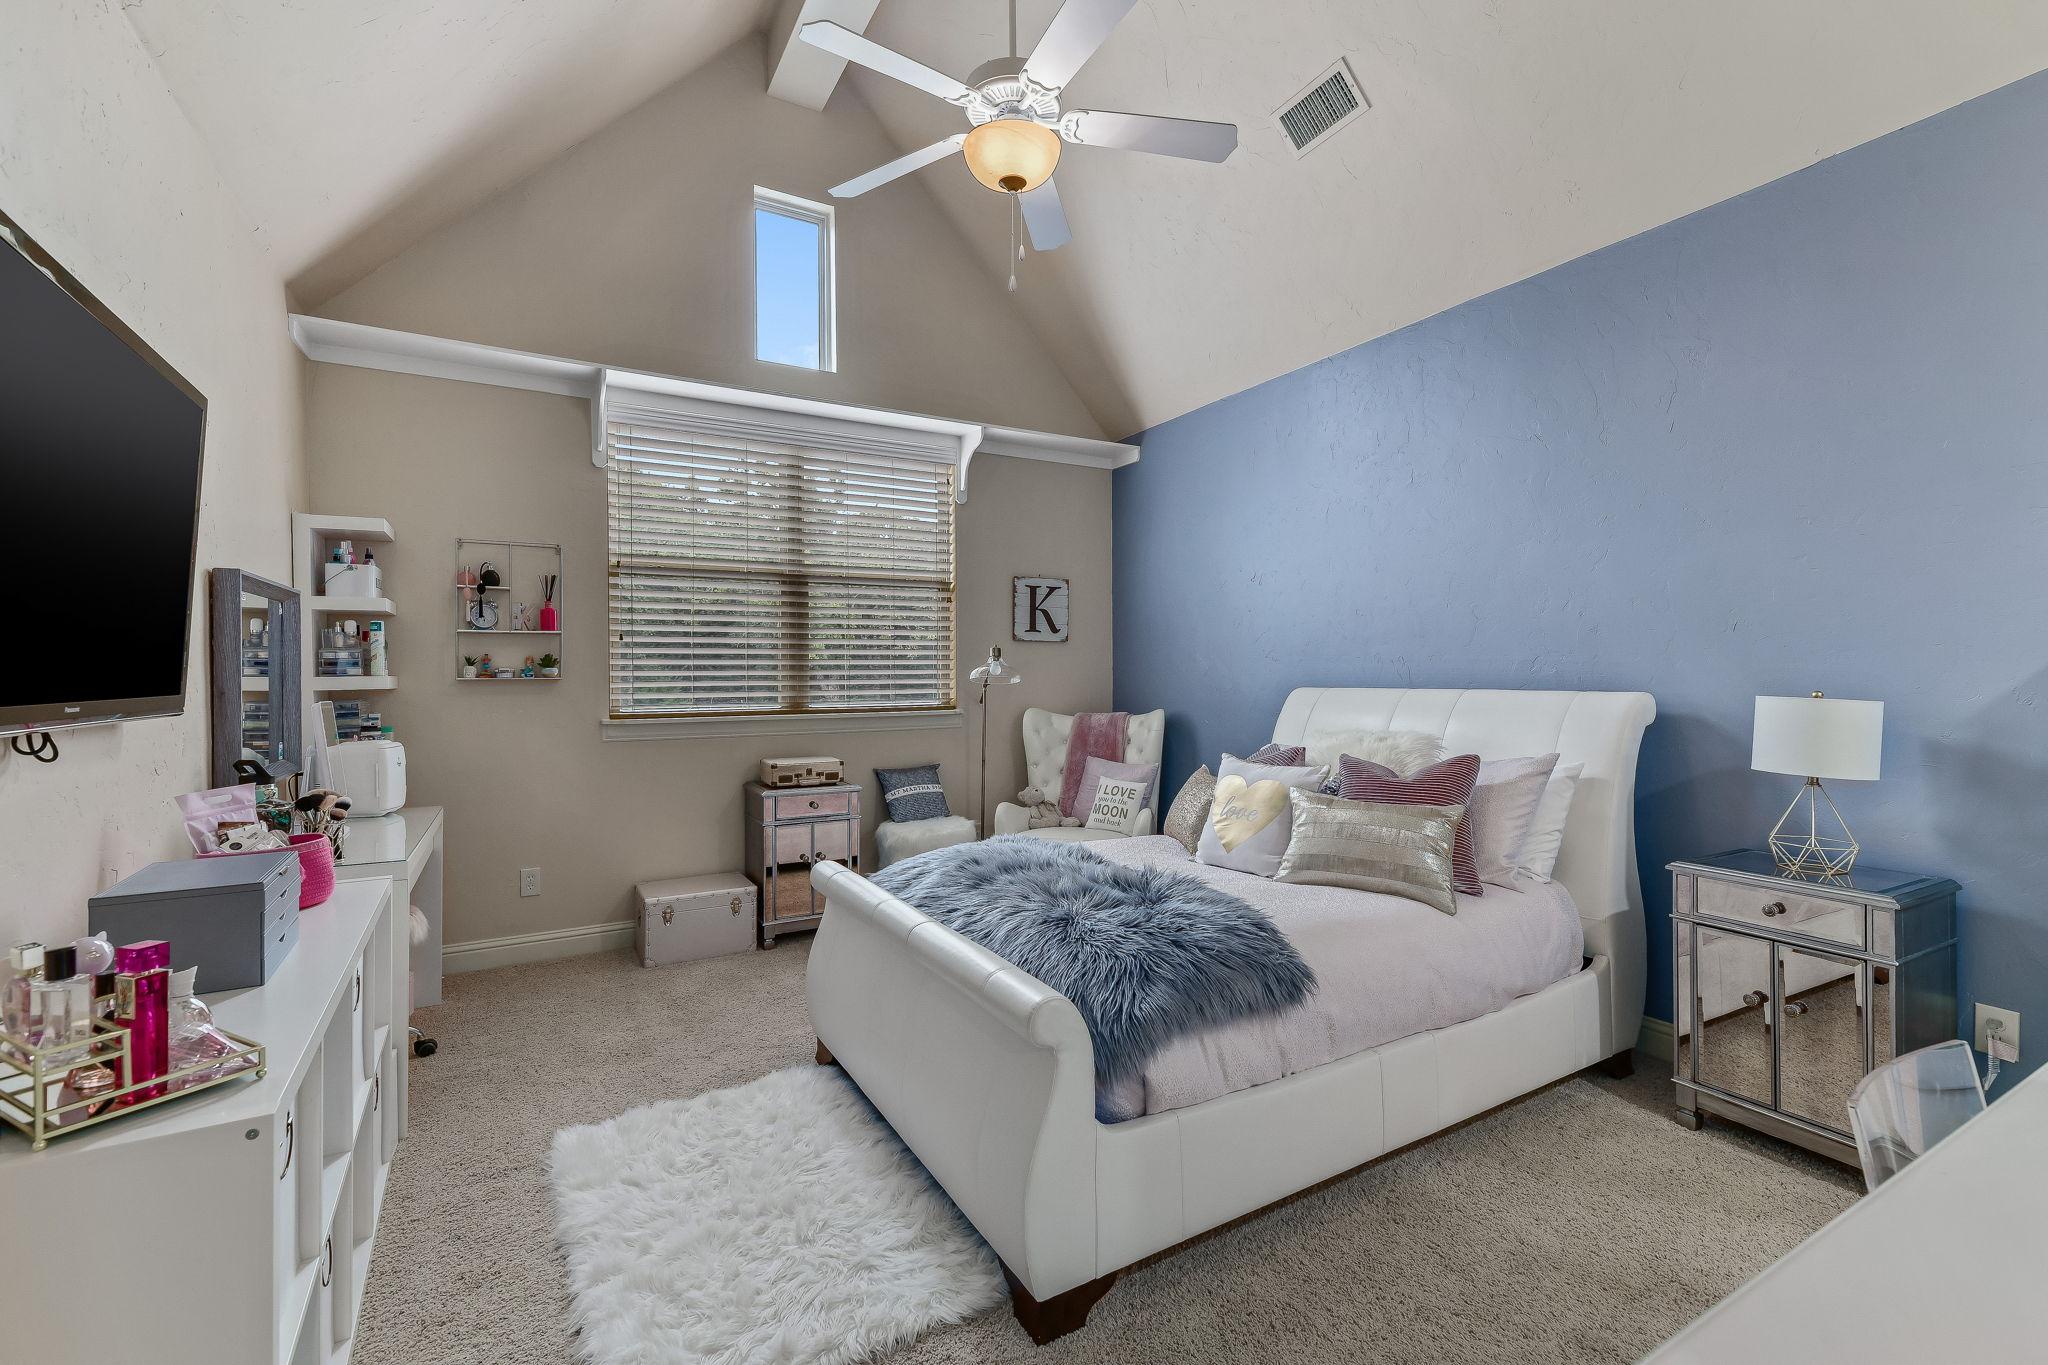 040-Bedroom 3-FULL